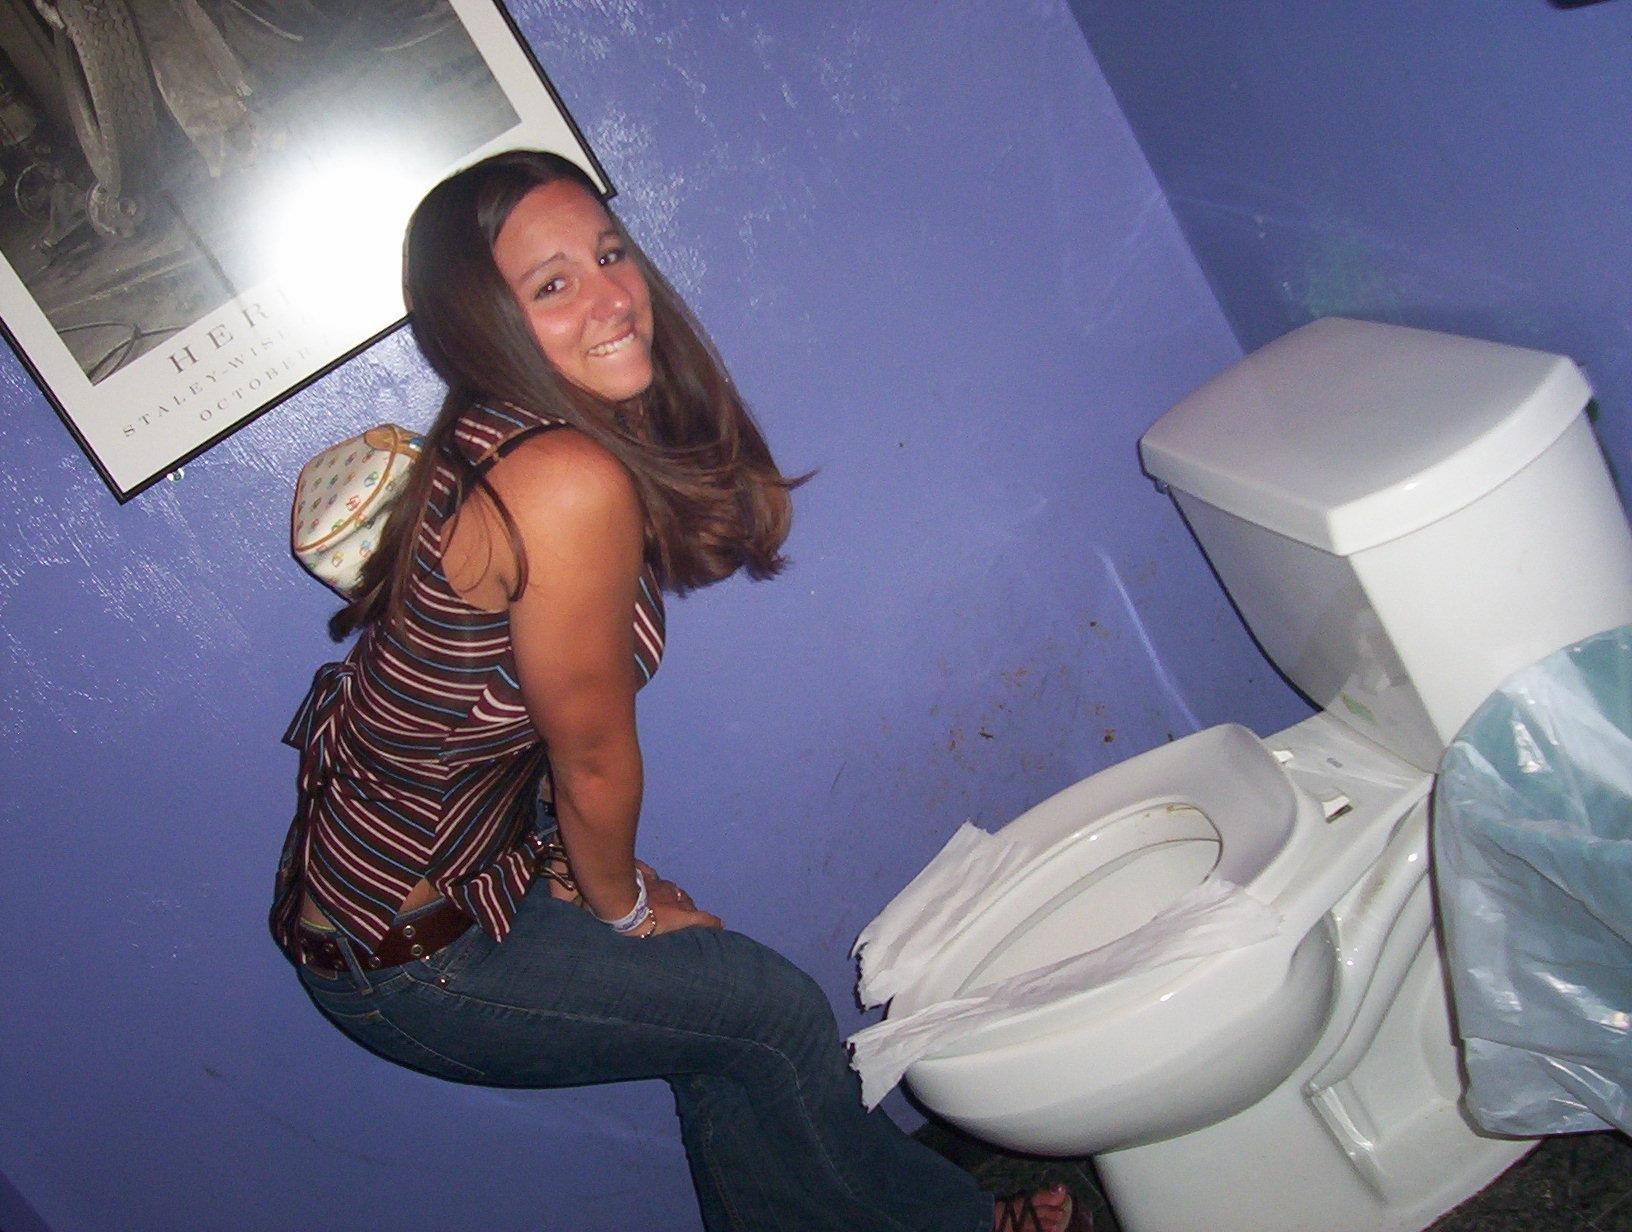 Toilet desperation peeing her pants